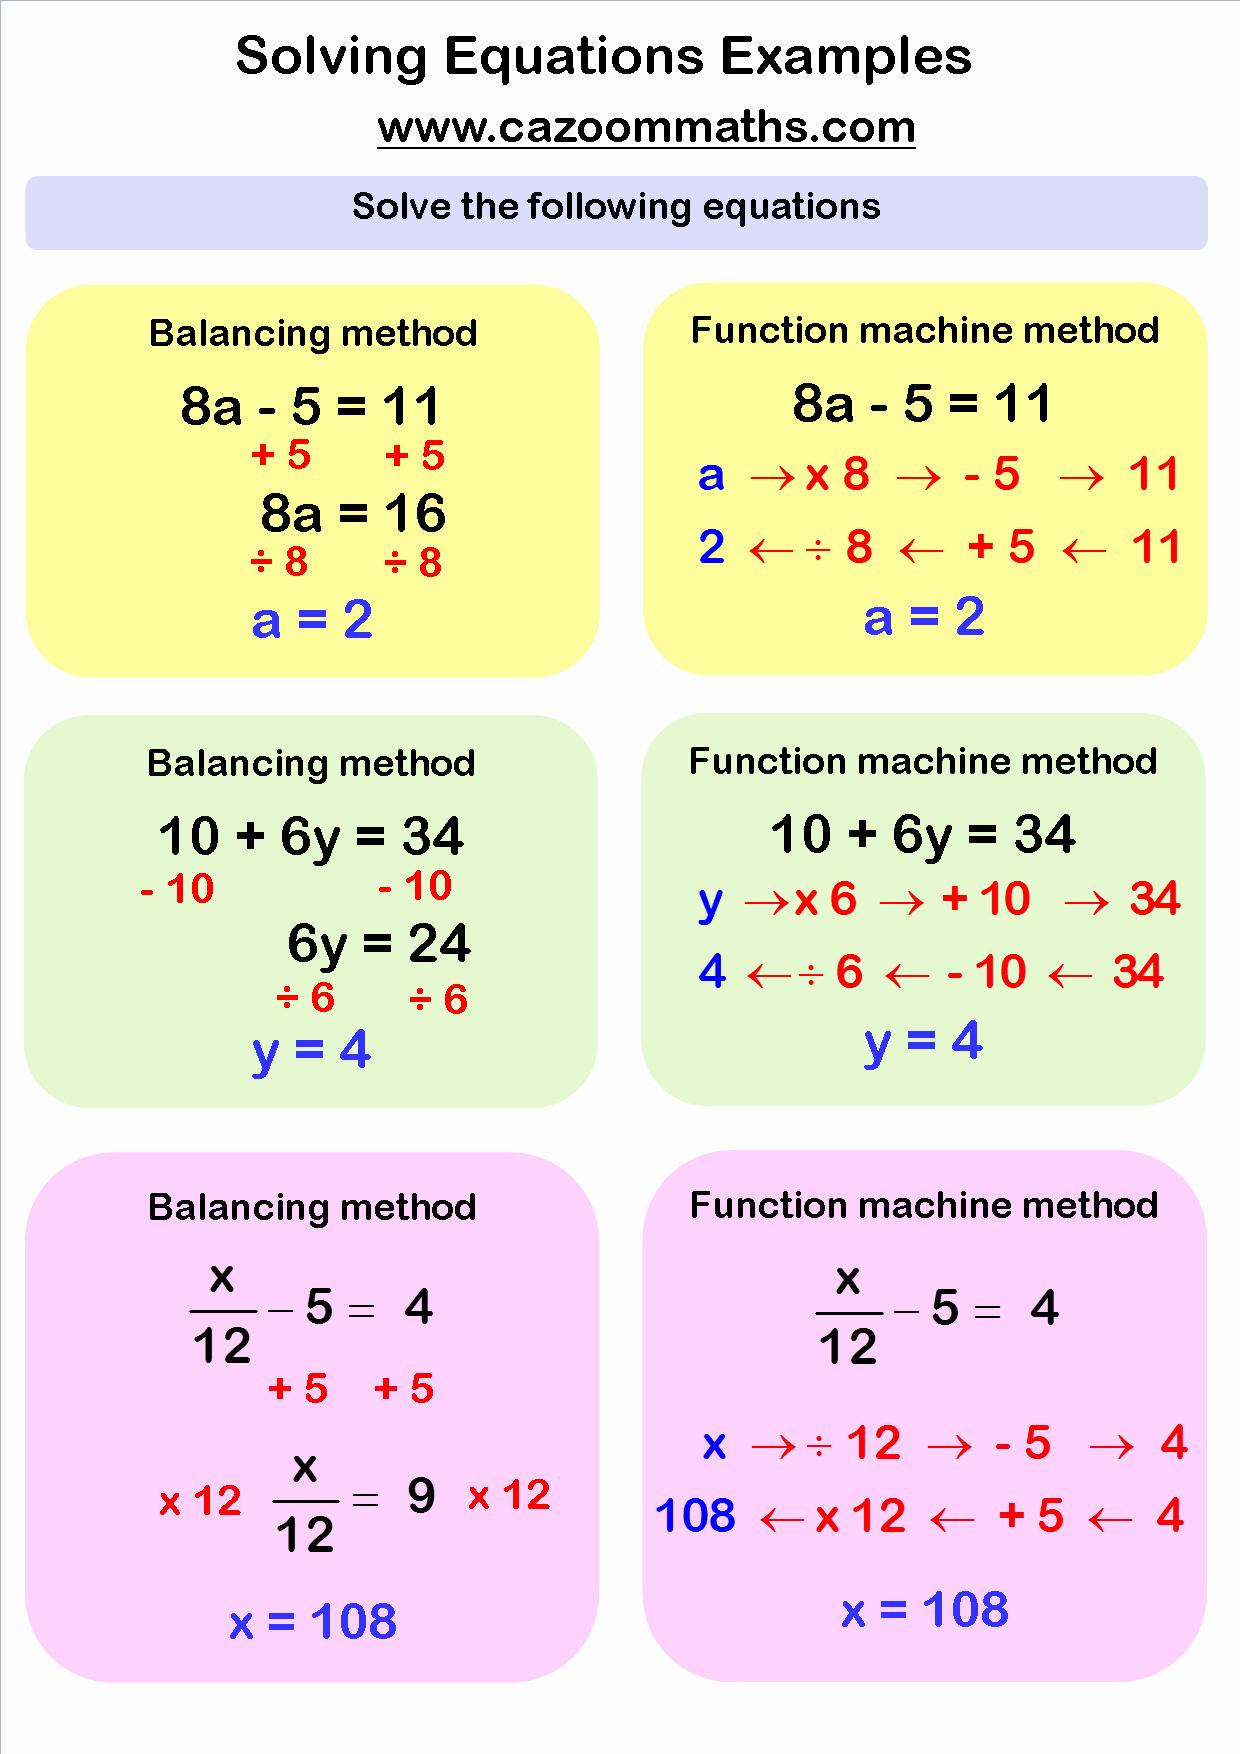 Solving Linear Equations Worksheet Pdf Unique solving Linear Equations Worksheets Pdf